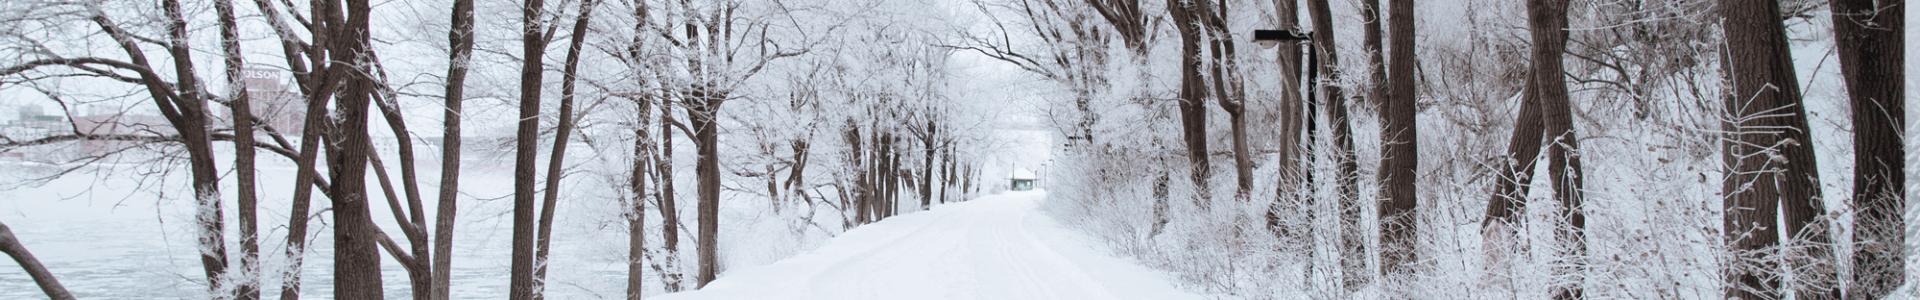 ziema nuotykiu parke